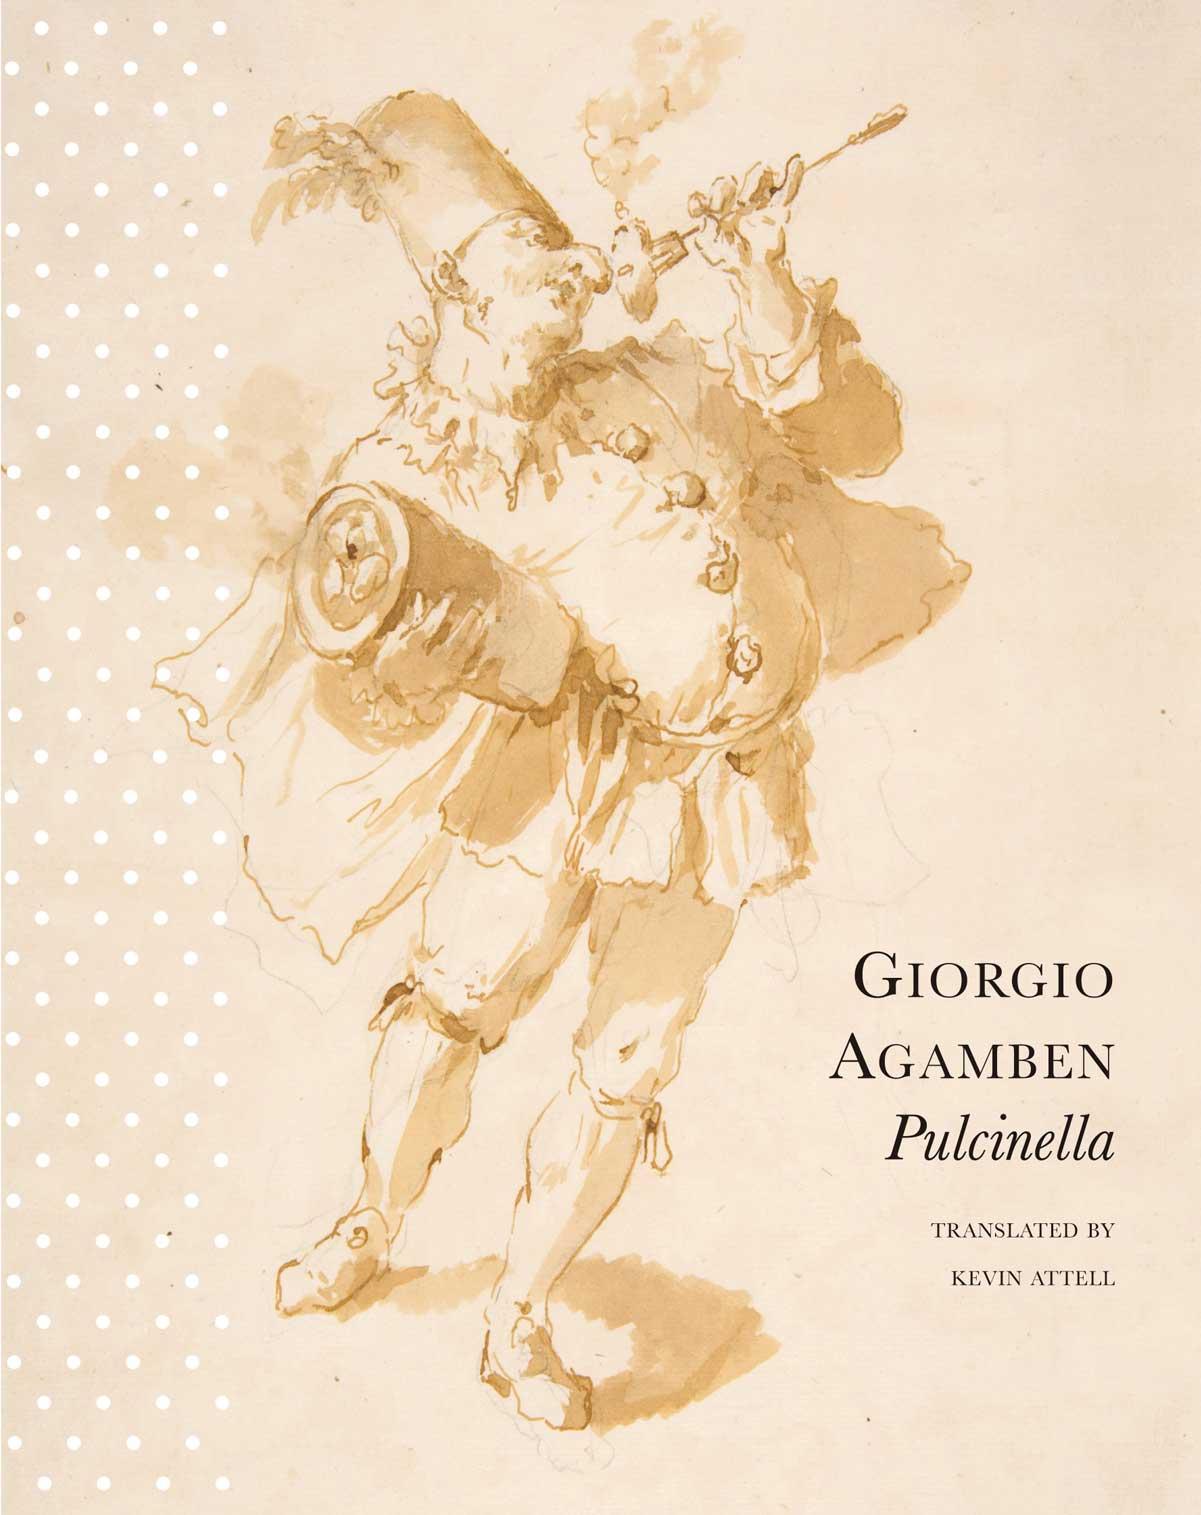 Pulcinella: or Entertainment for Kids in Four Scenes by Carlo Ginzburg | Seagull Books